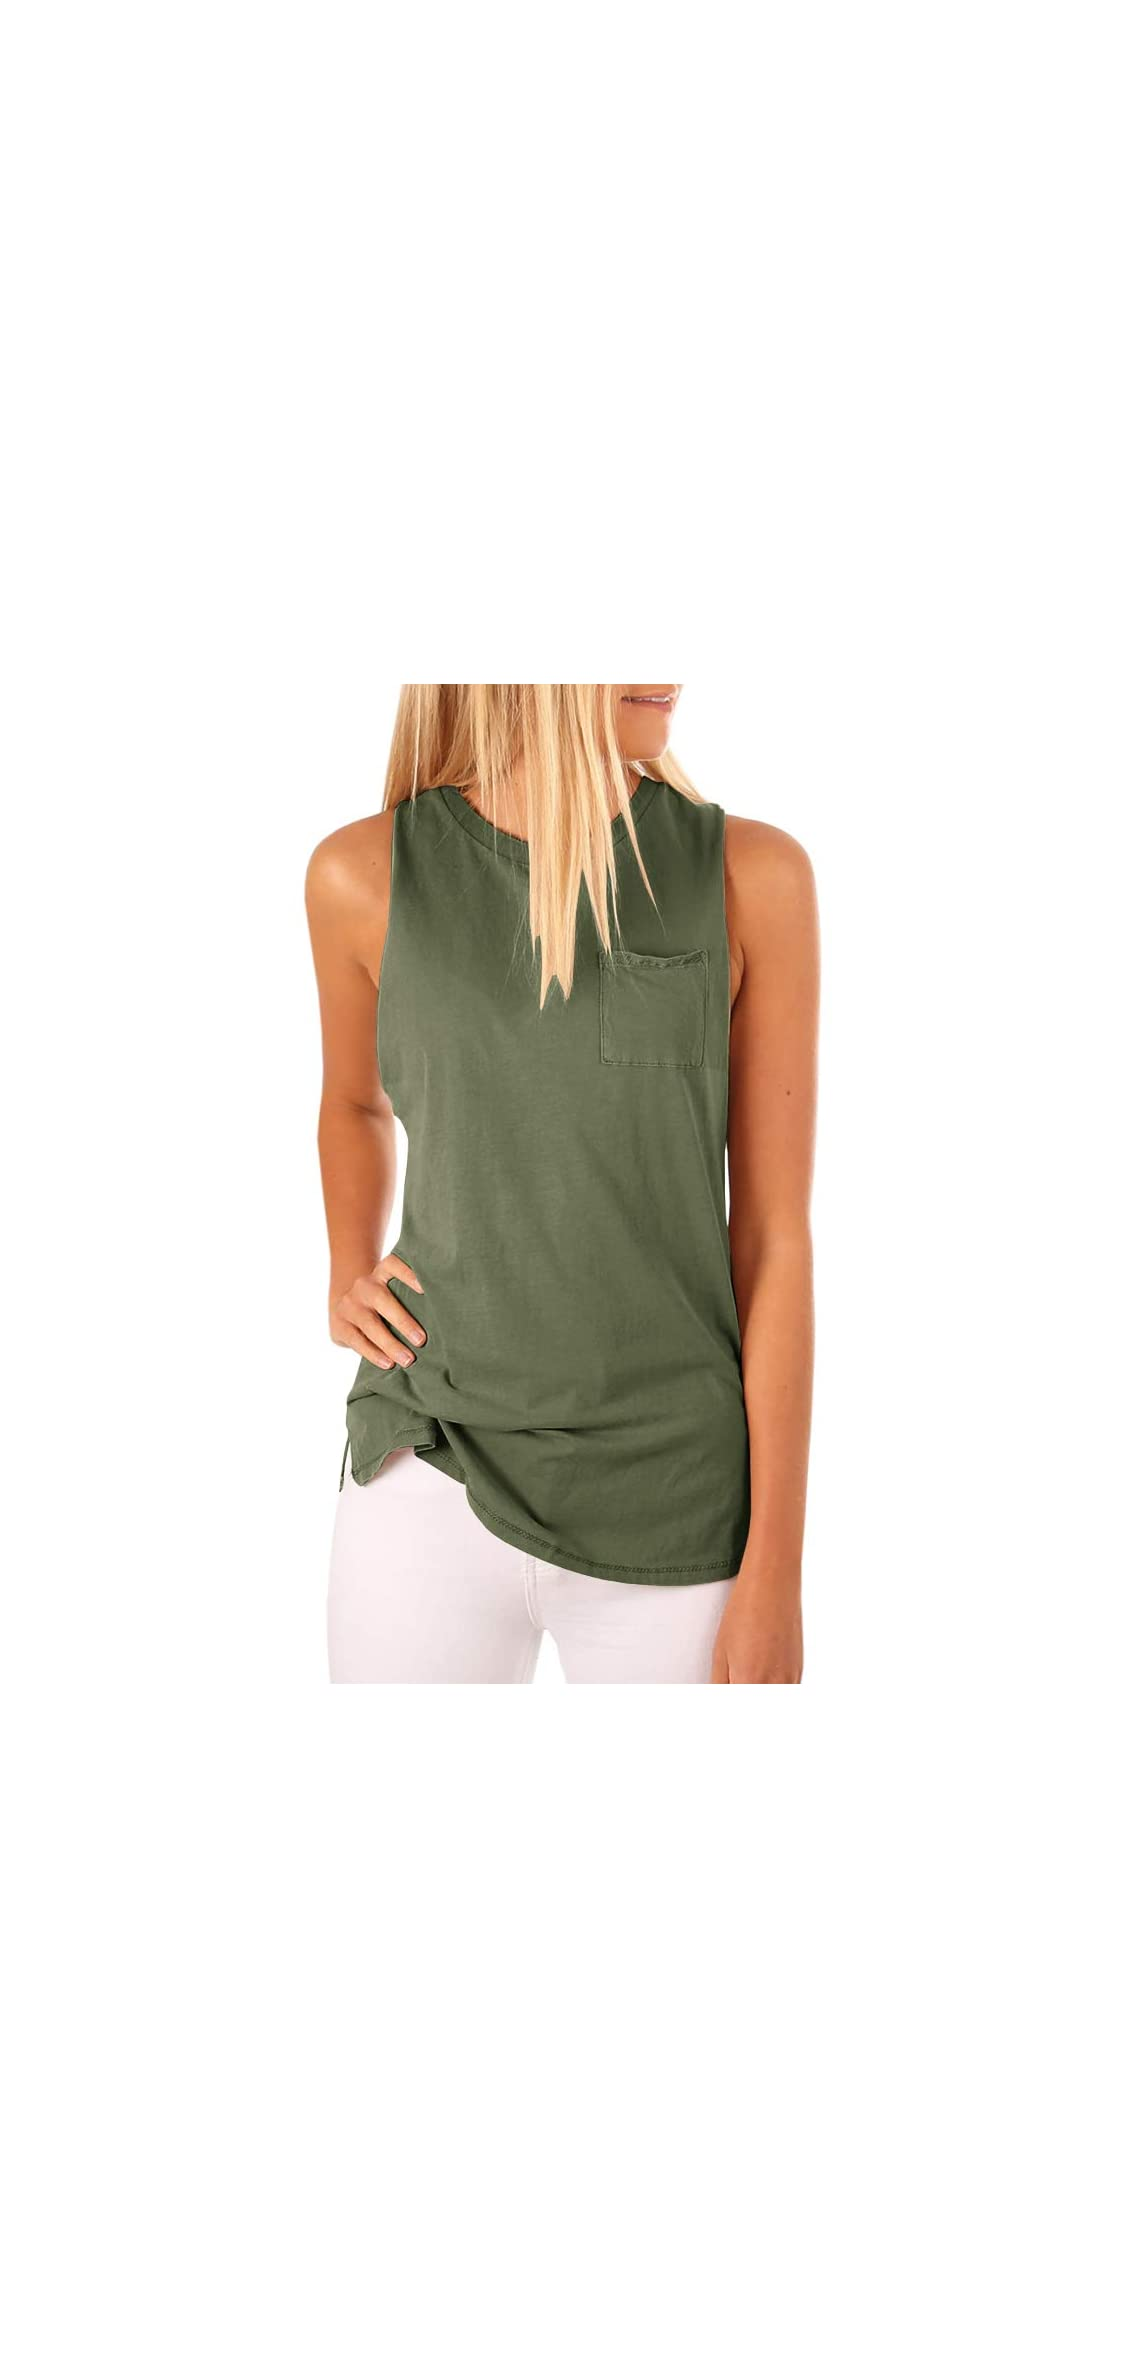 Women's High Neck Tank Top Sleeveless Blouse Plain T Shirts Cami